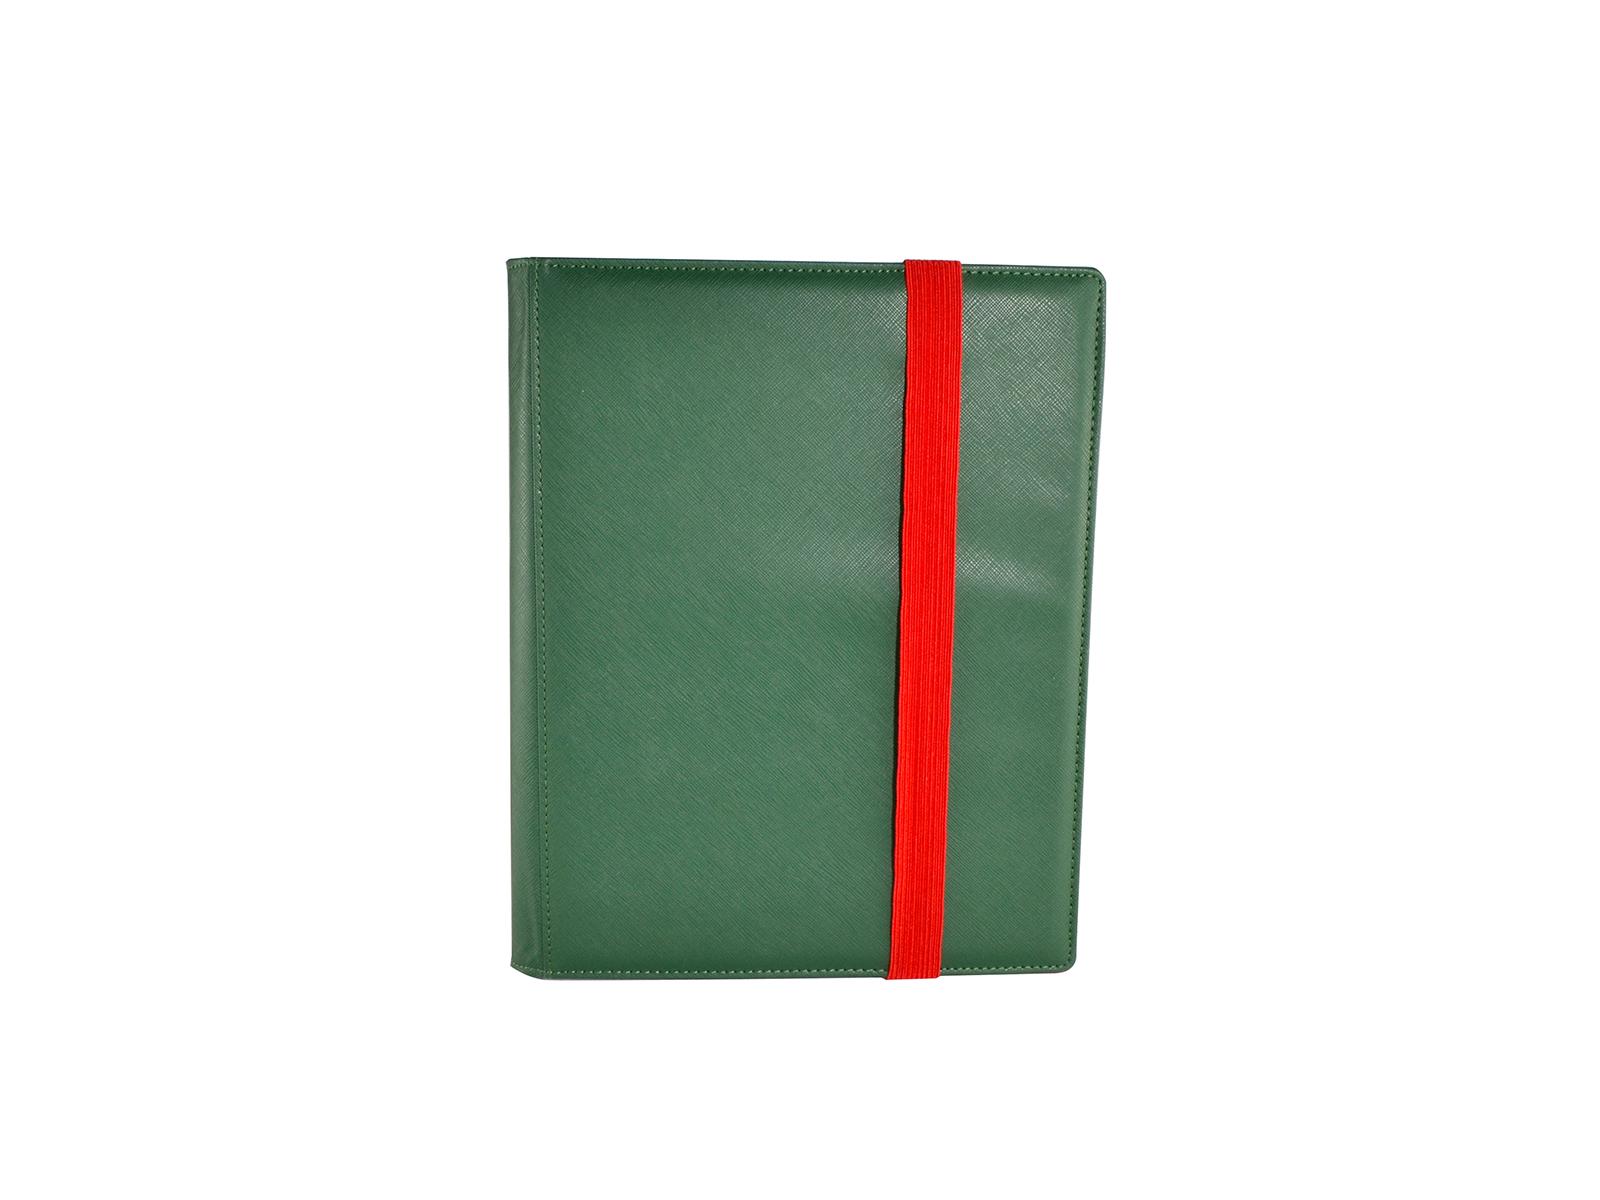 The Dex Binder 9 - Green